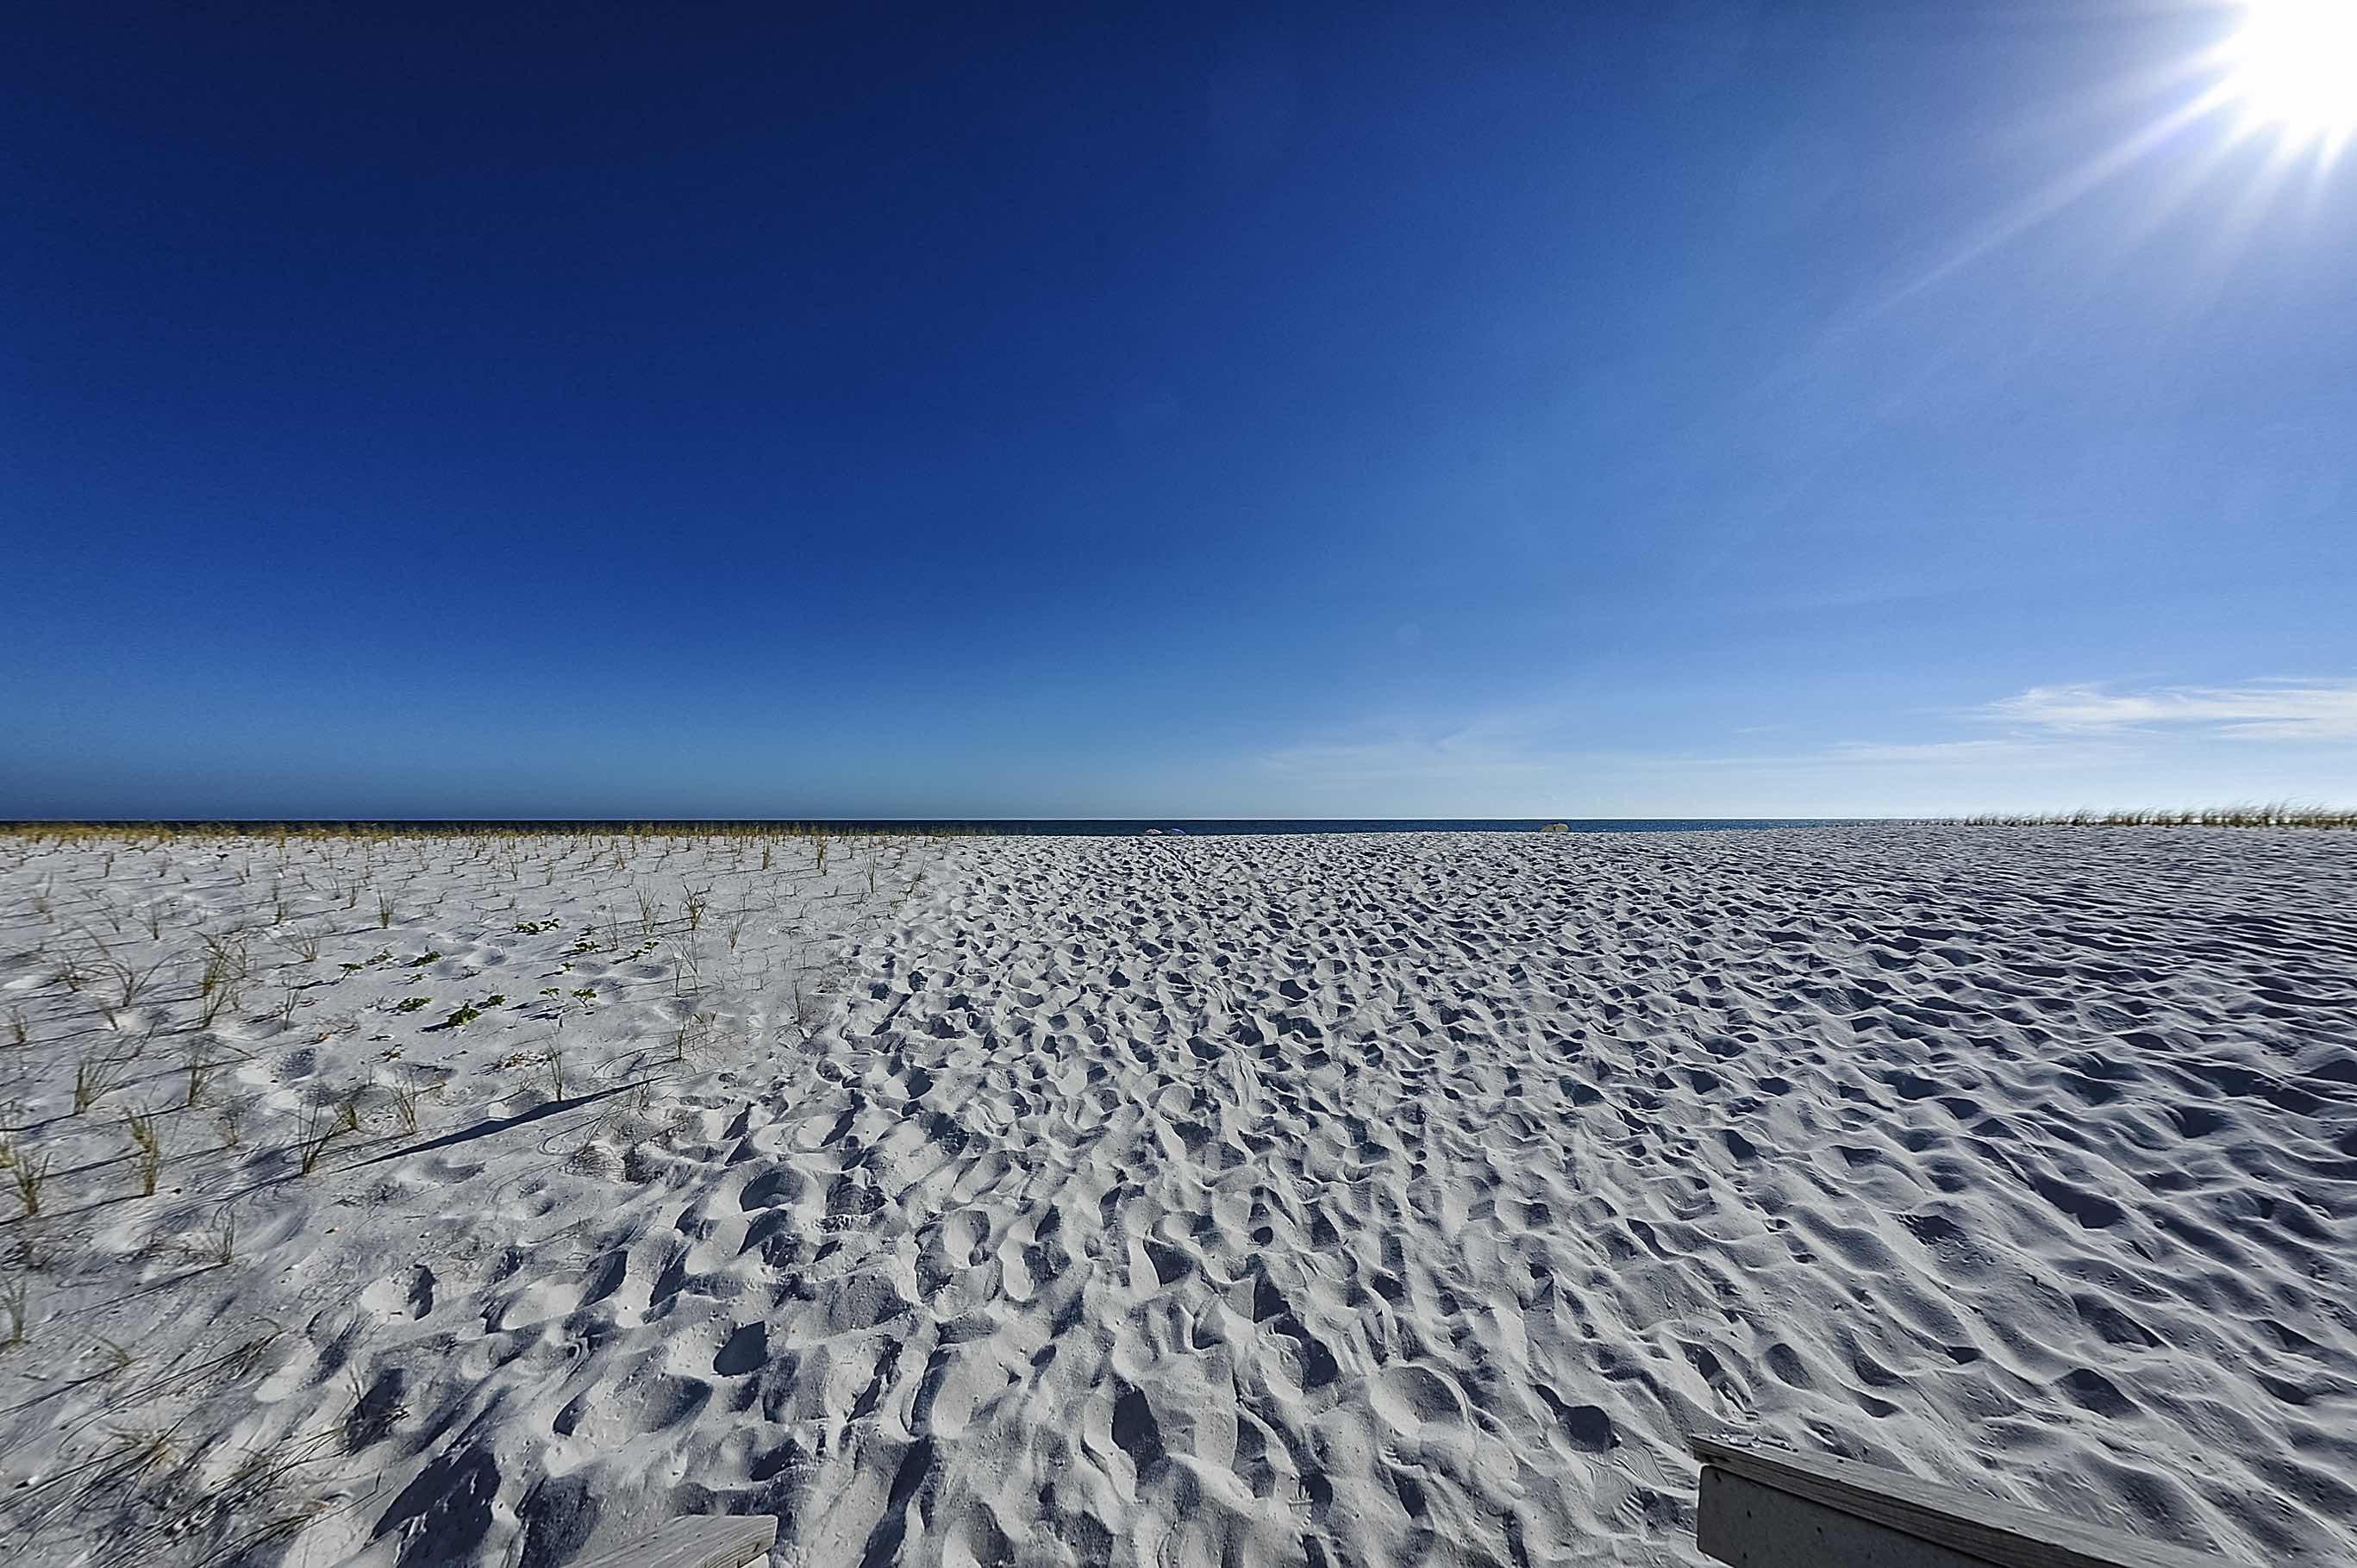 Navarre Beach Florida Gulf Beach Weddings 850 898 0600